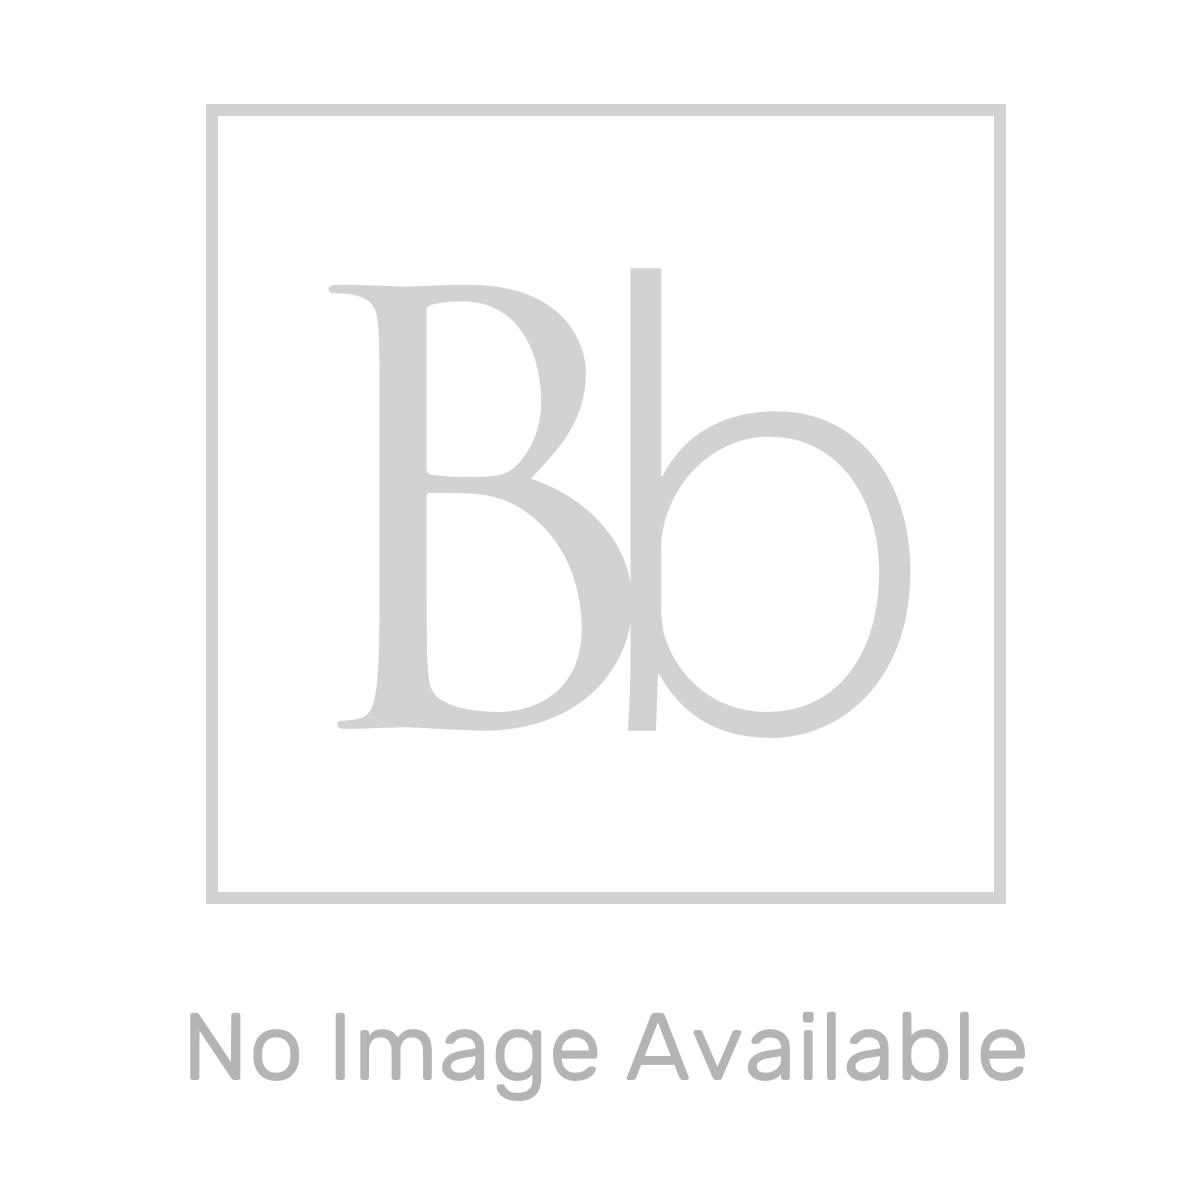 Nuie Athena Gloss Grey Mist 2 Door Floor Standing Vanity Unit with 40mm Profile Basin 600mm Line Drawing